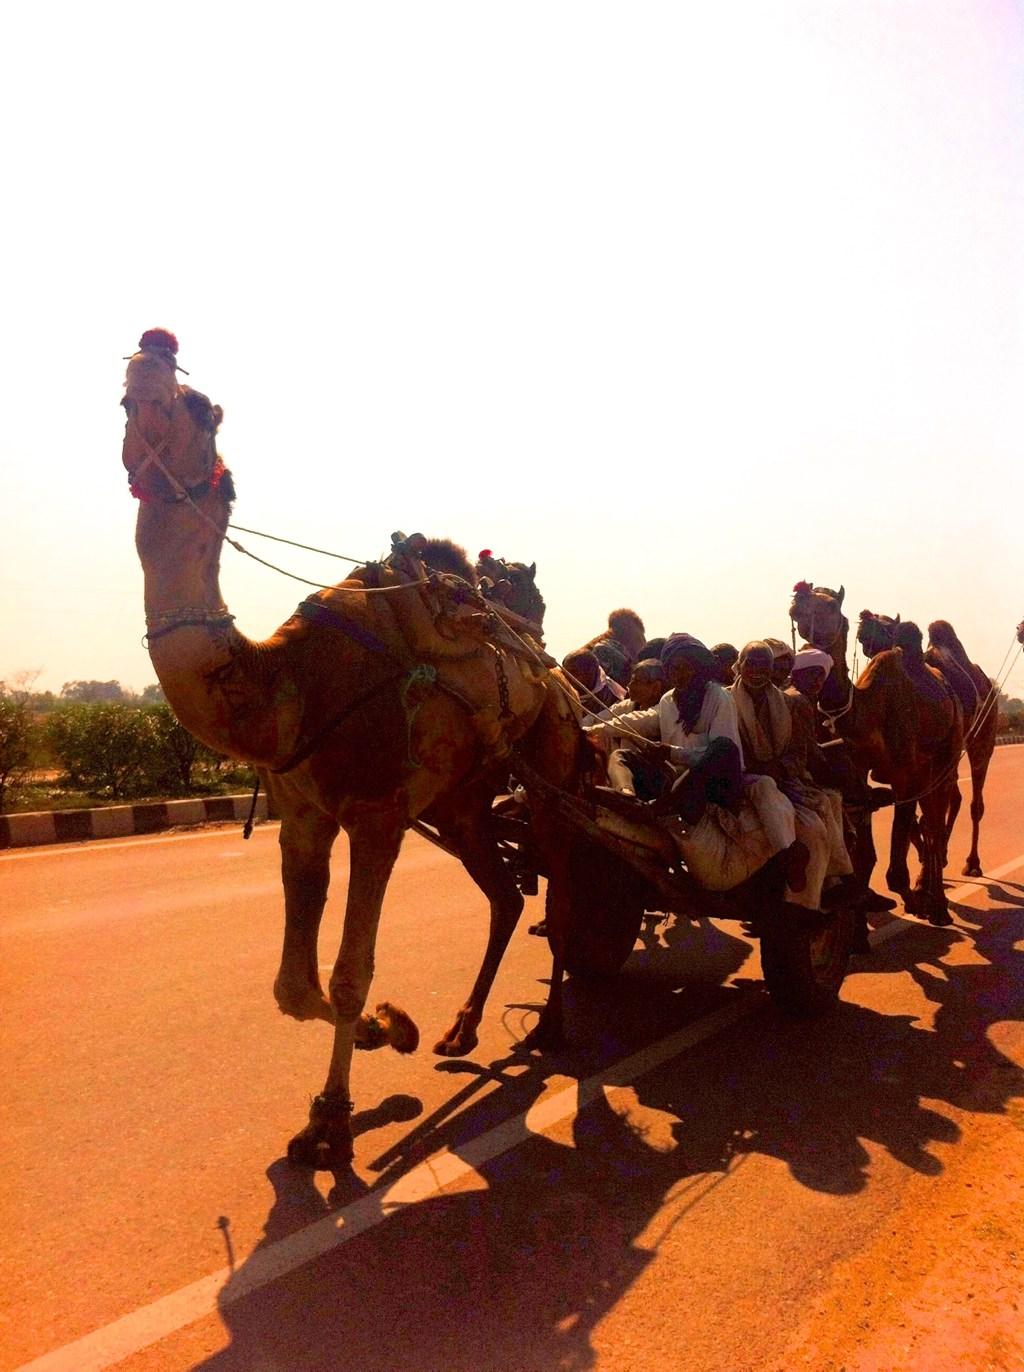 Rajasthan traffic - nothing quite like it...